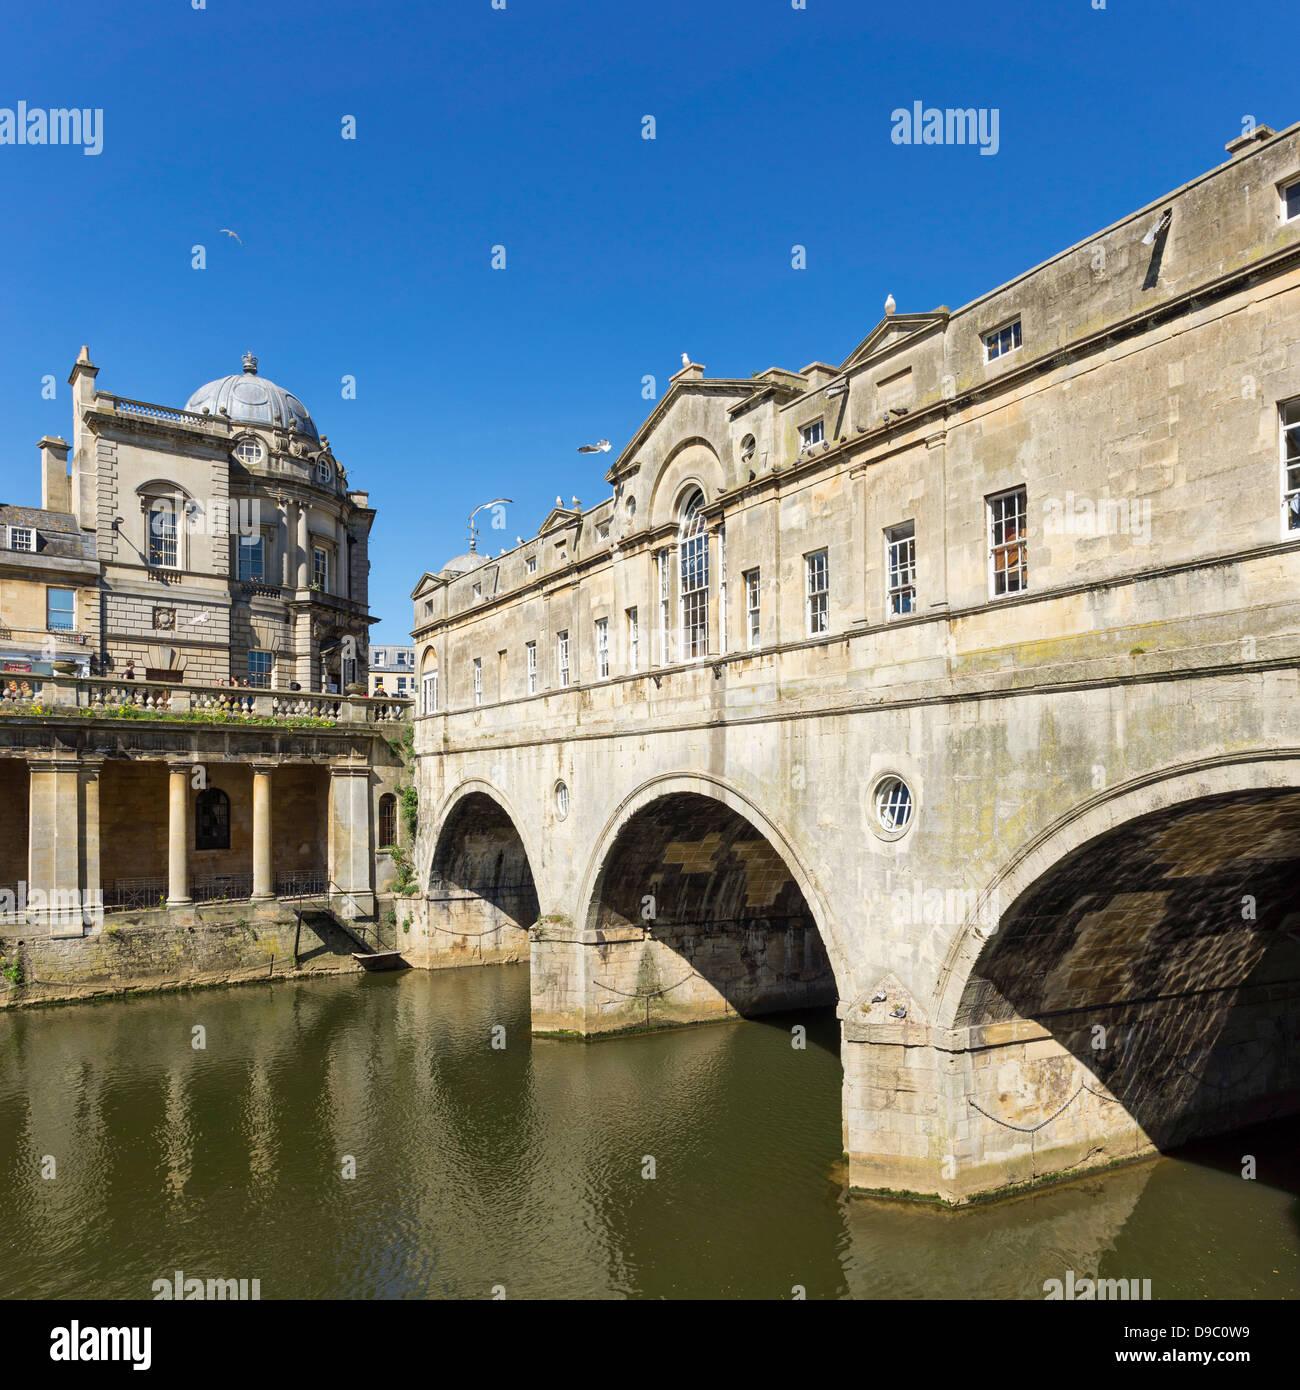 Pulteney Bridge, Bath, England Stockbild